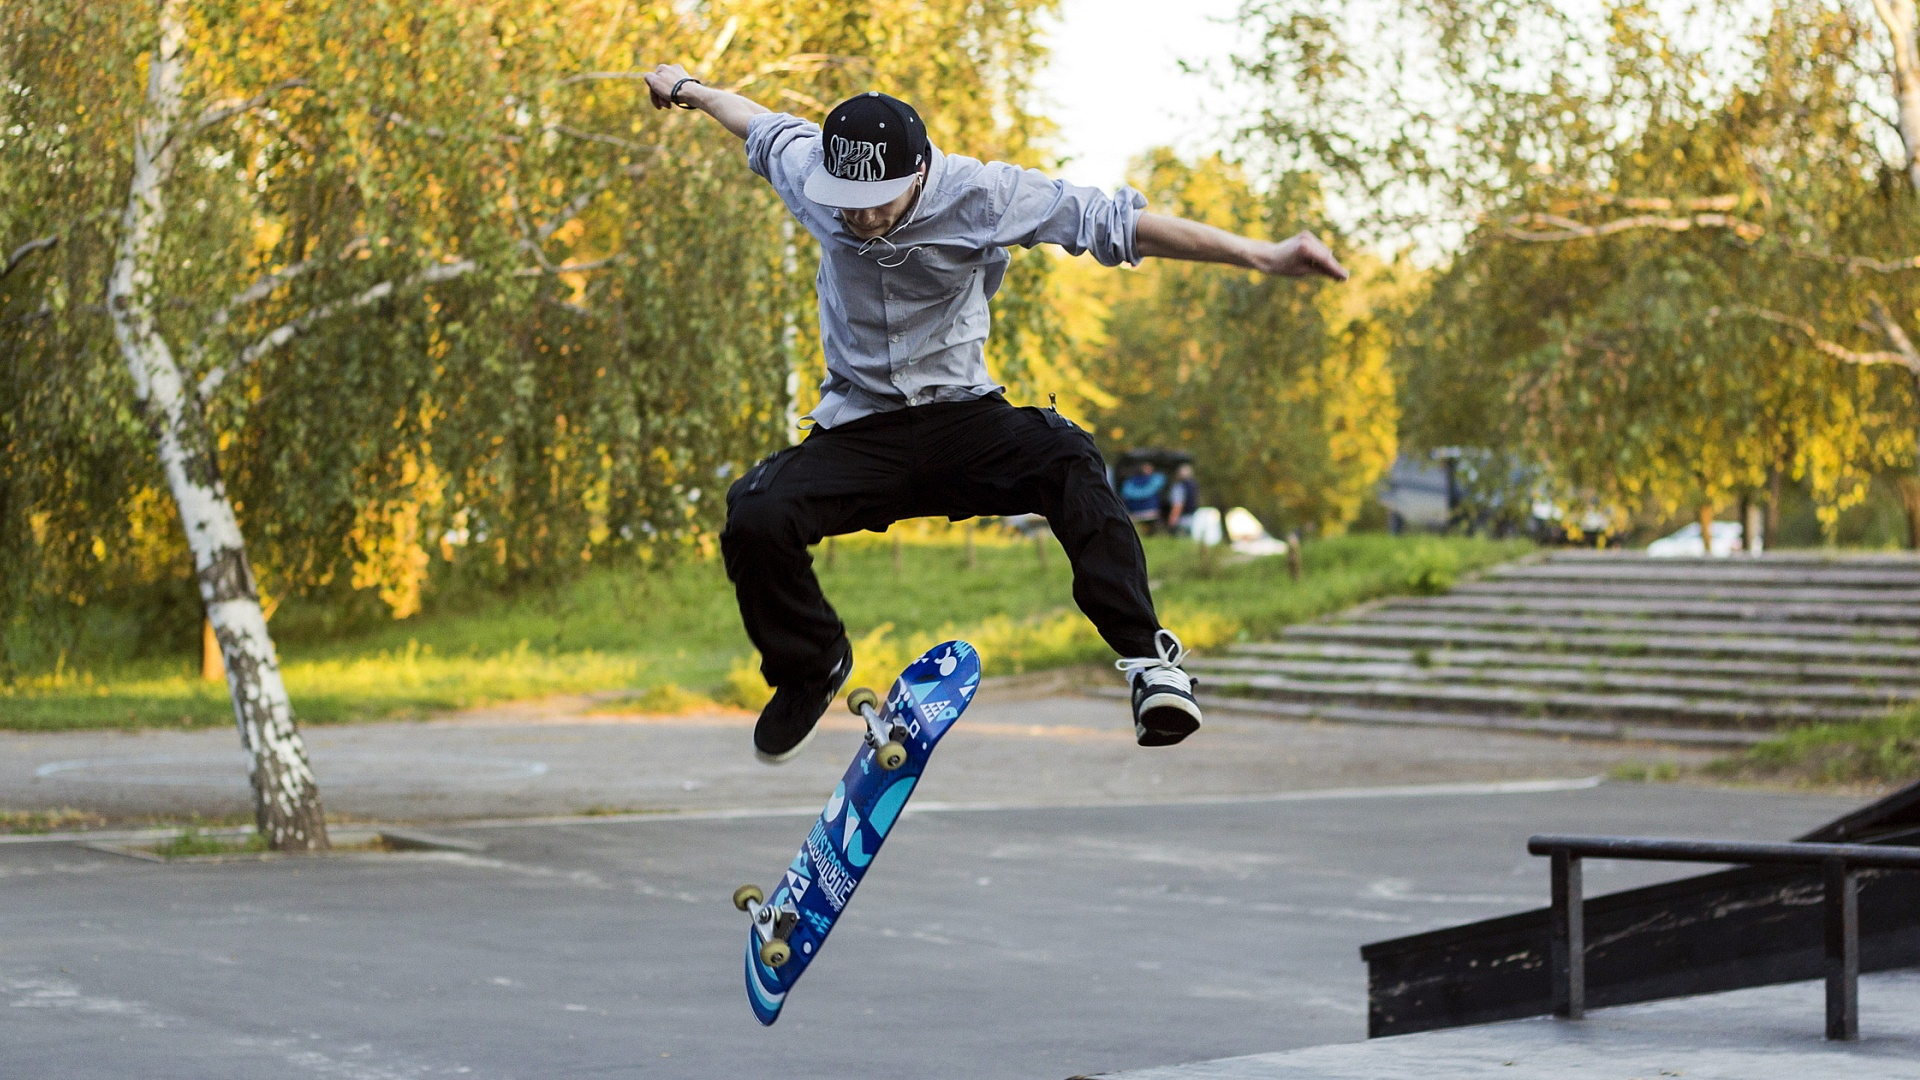 48+ Skateboard Wallpaper for Desktop on WallpaperSafari